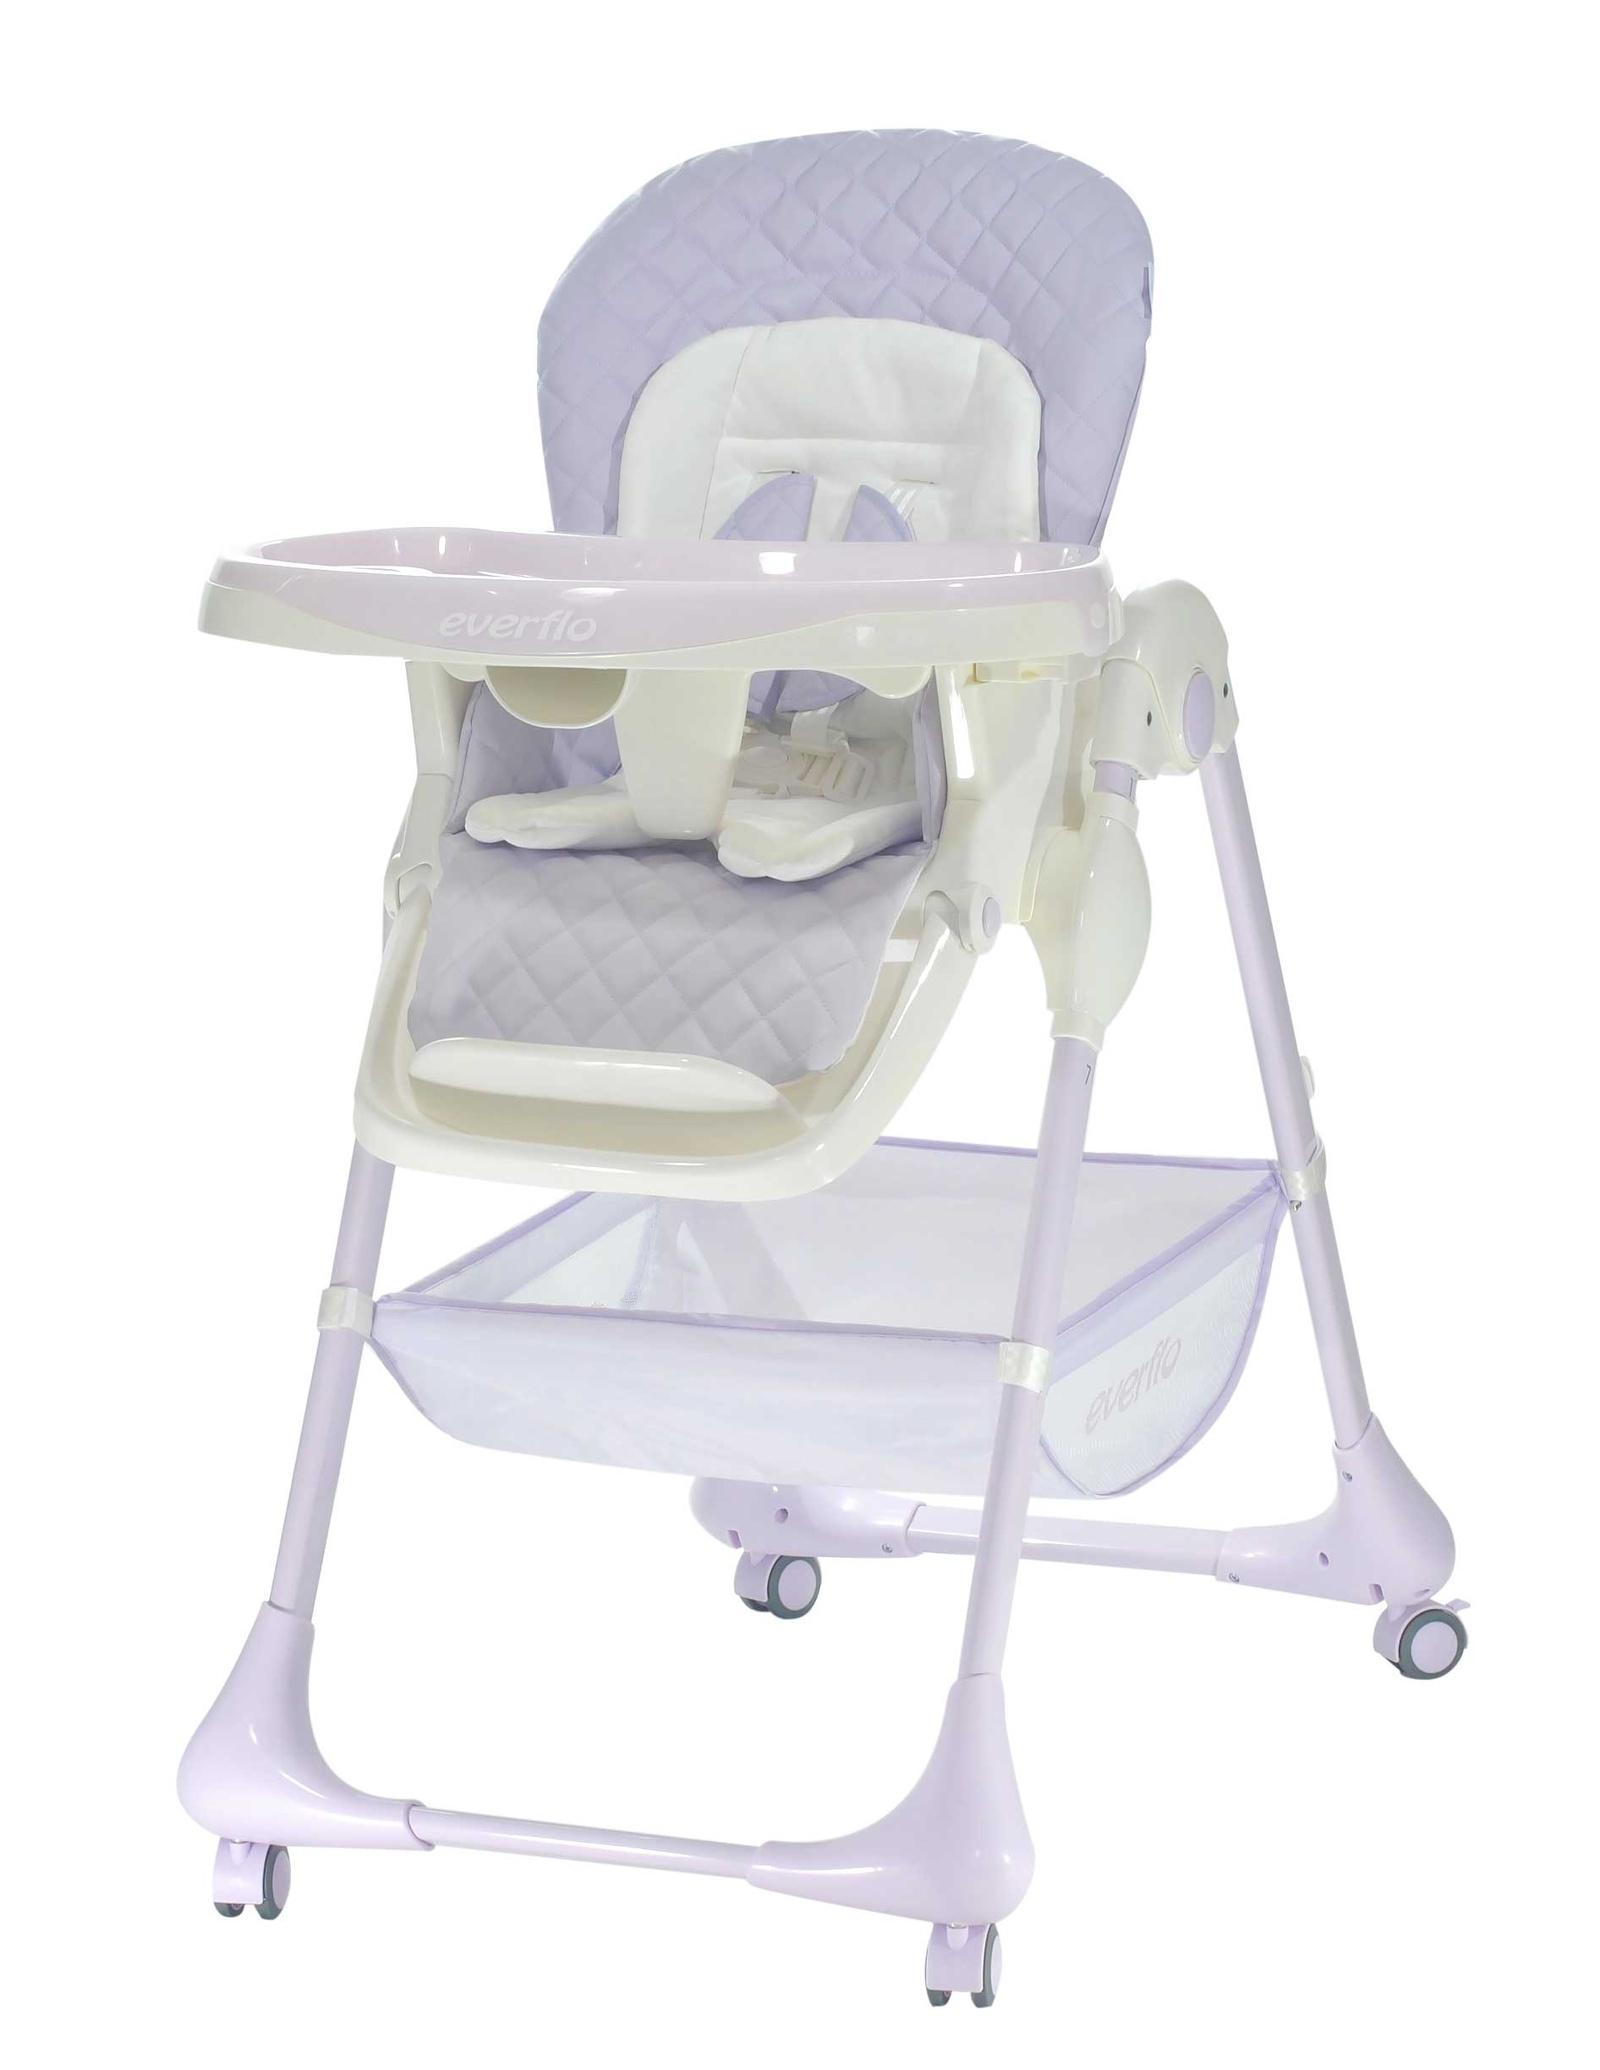 Аксессуар к стульчикам для кормления Everflo Gently Provence (Q55) стул everflo gently provence q55